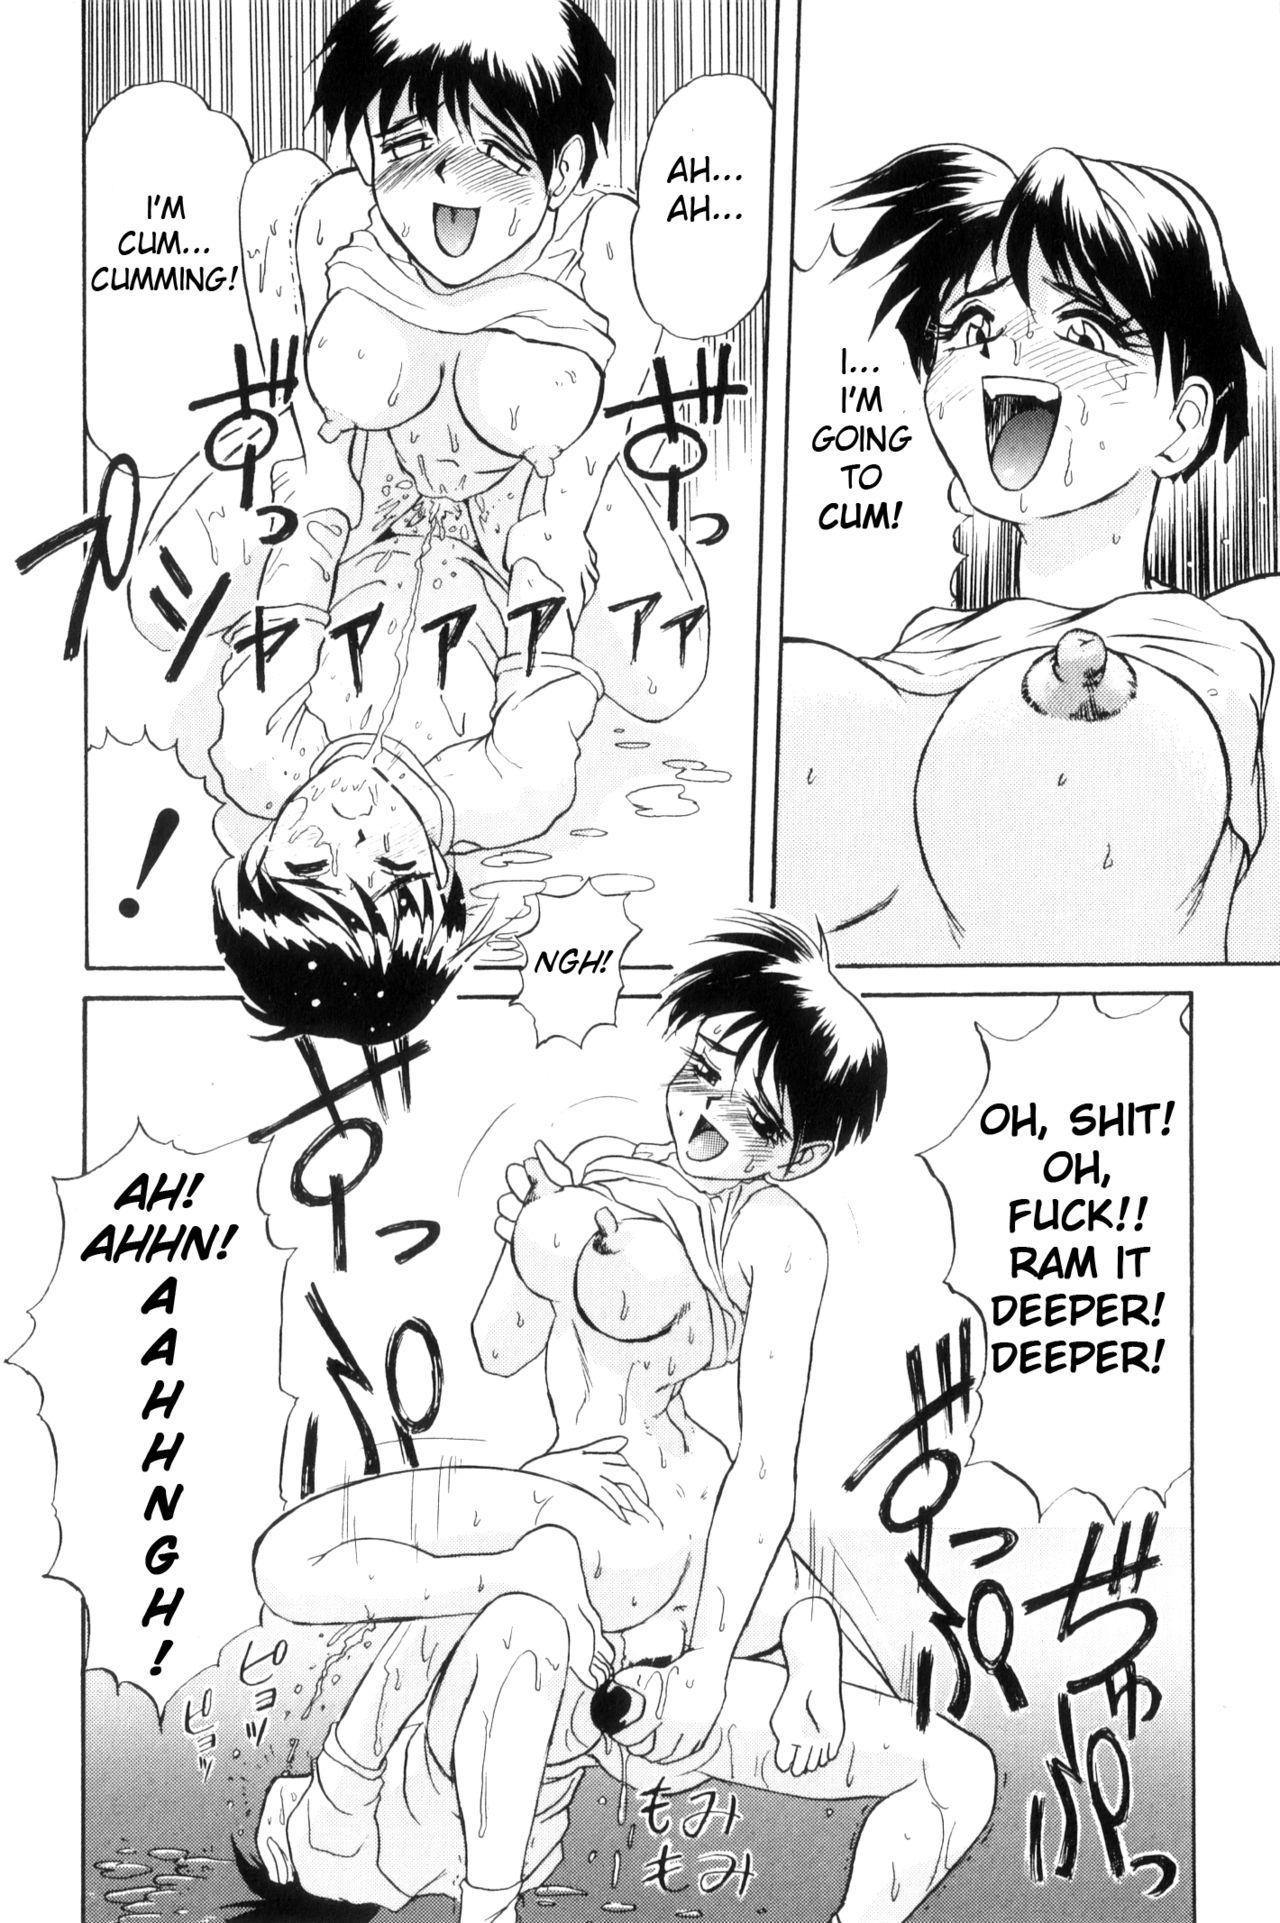 [NeWMeN] Secret Plot [Shinsouban] Ch. 1-6 [English] 101